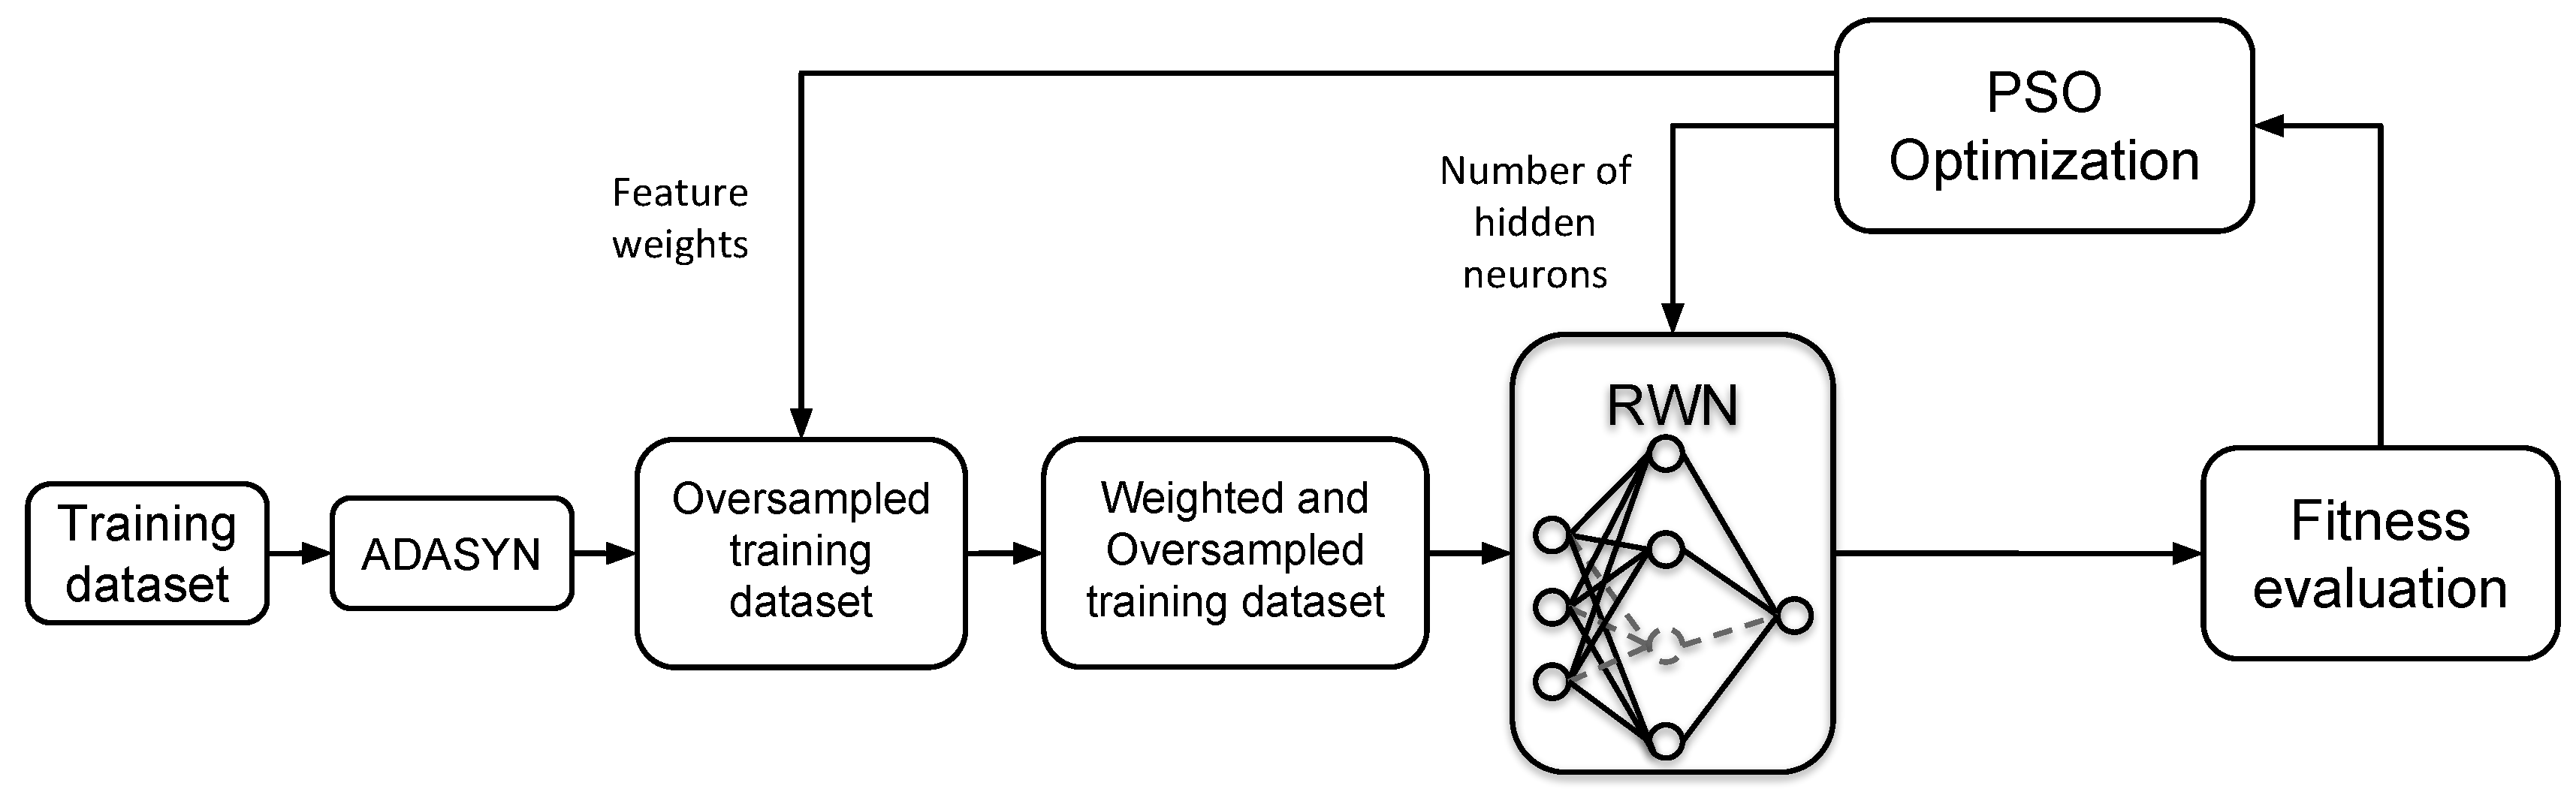 Information | Free Full-Text | A Hybrid Swarm Intelligent